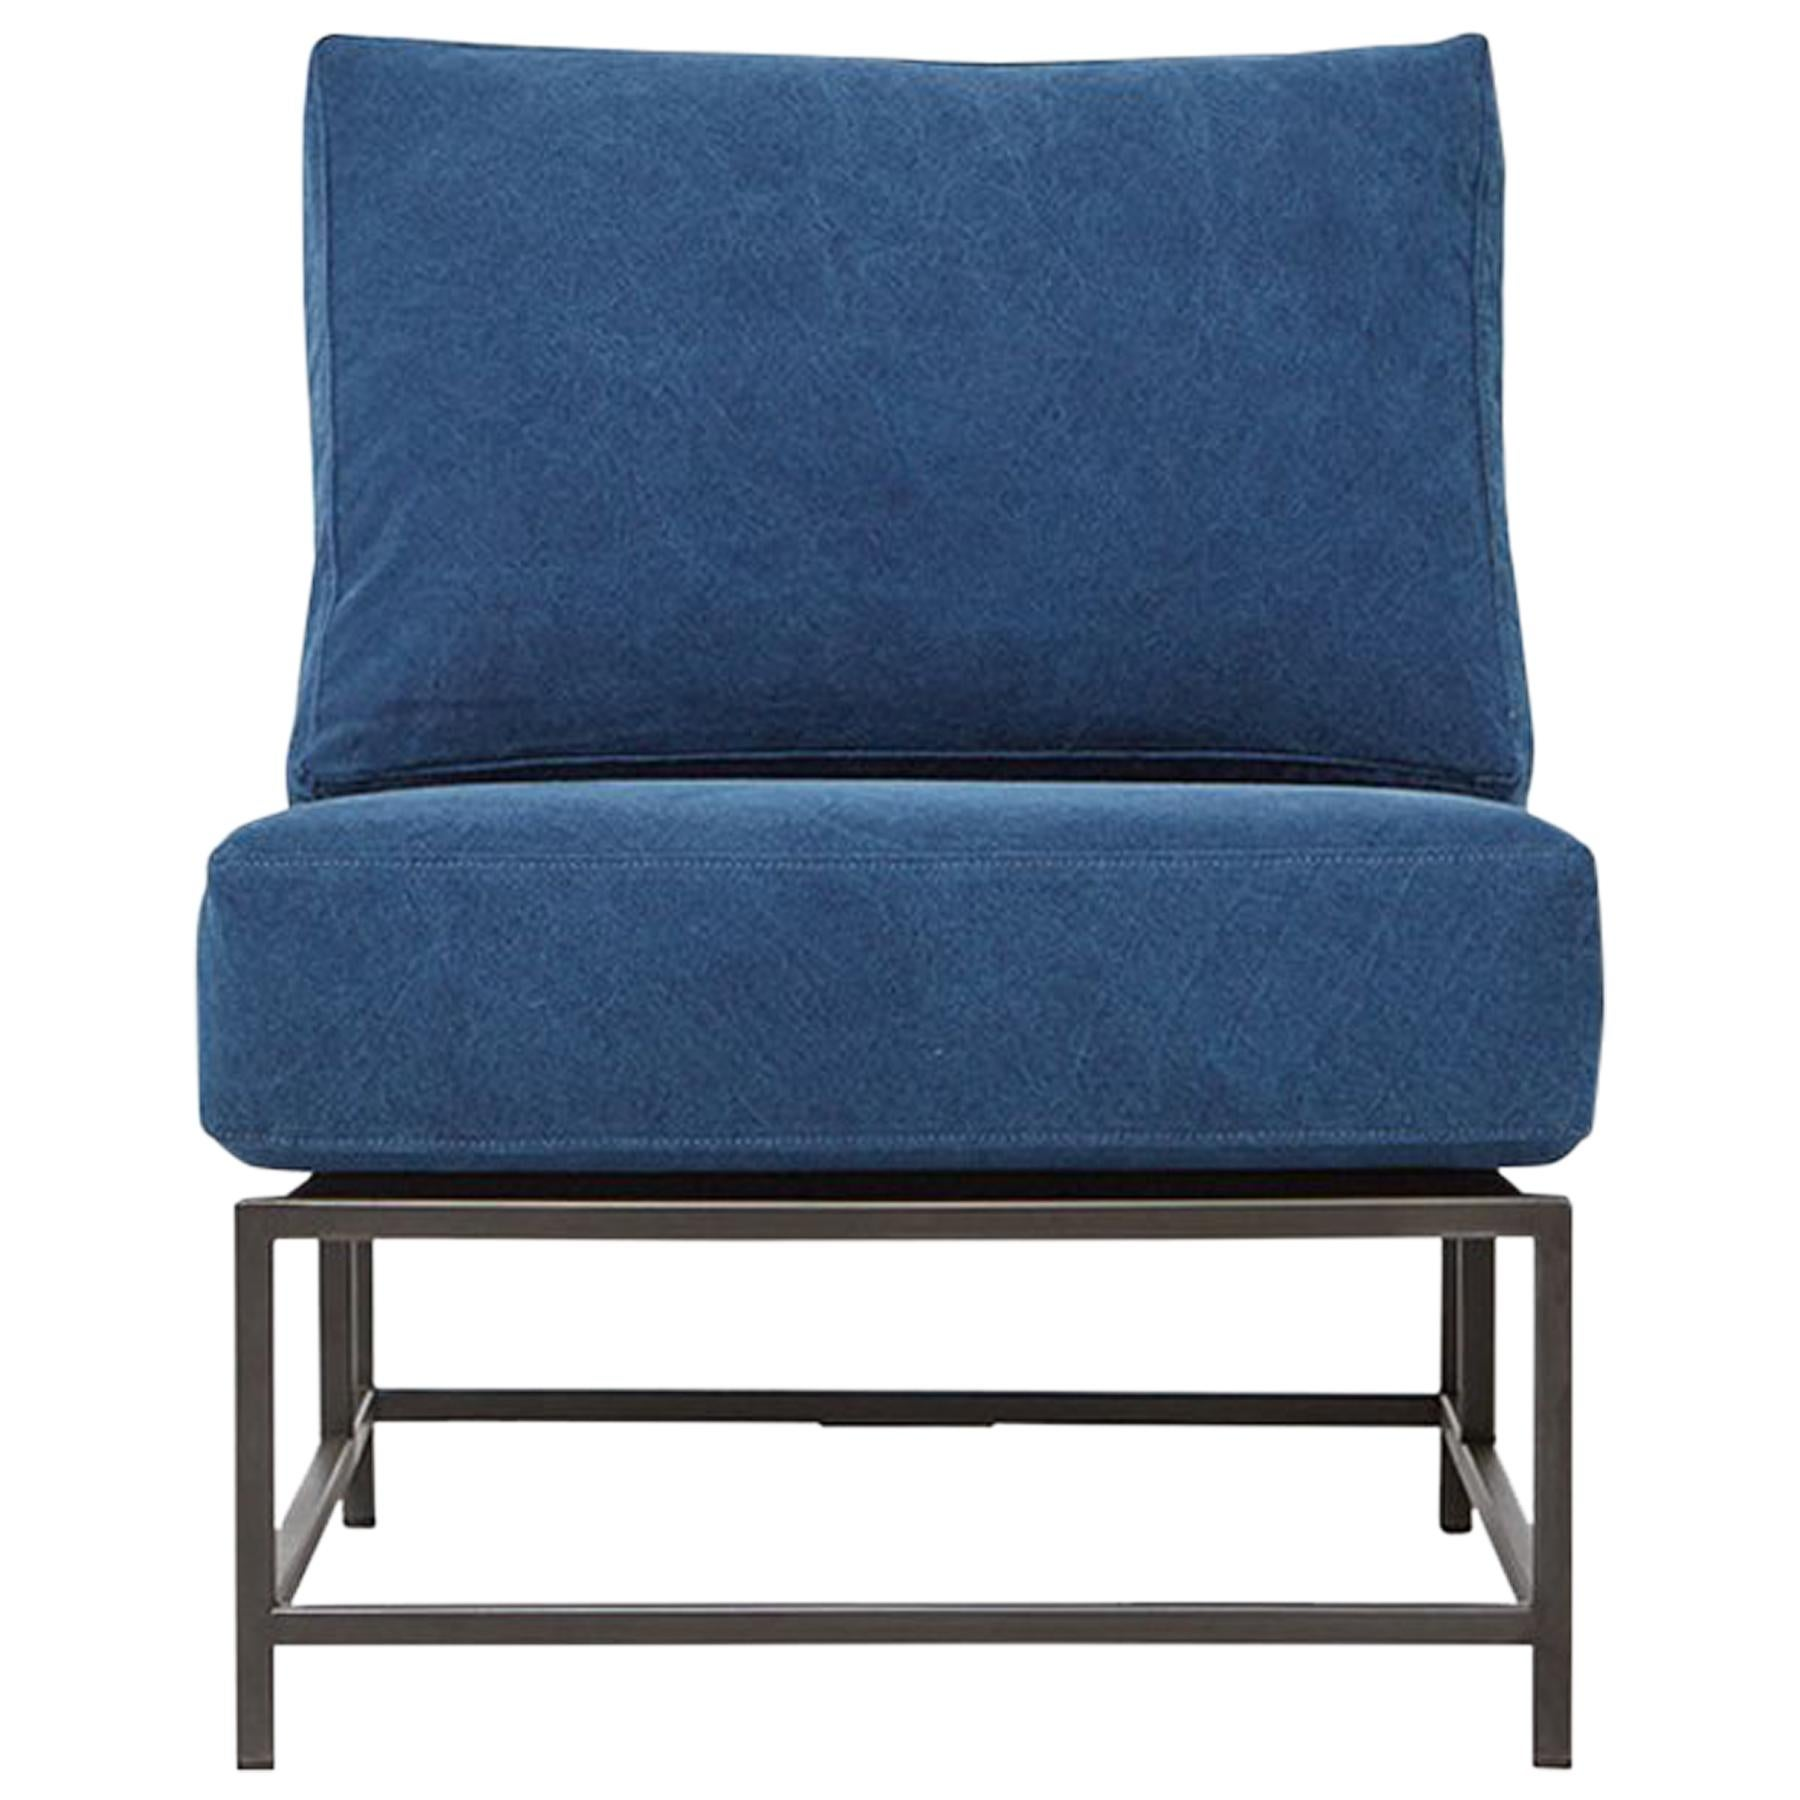 Indigo Canvas and Blackened Steel Chair